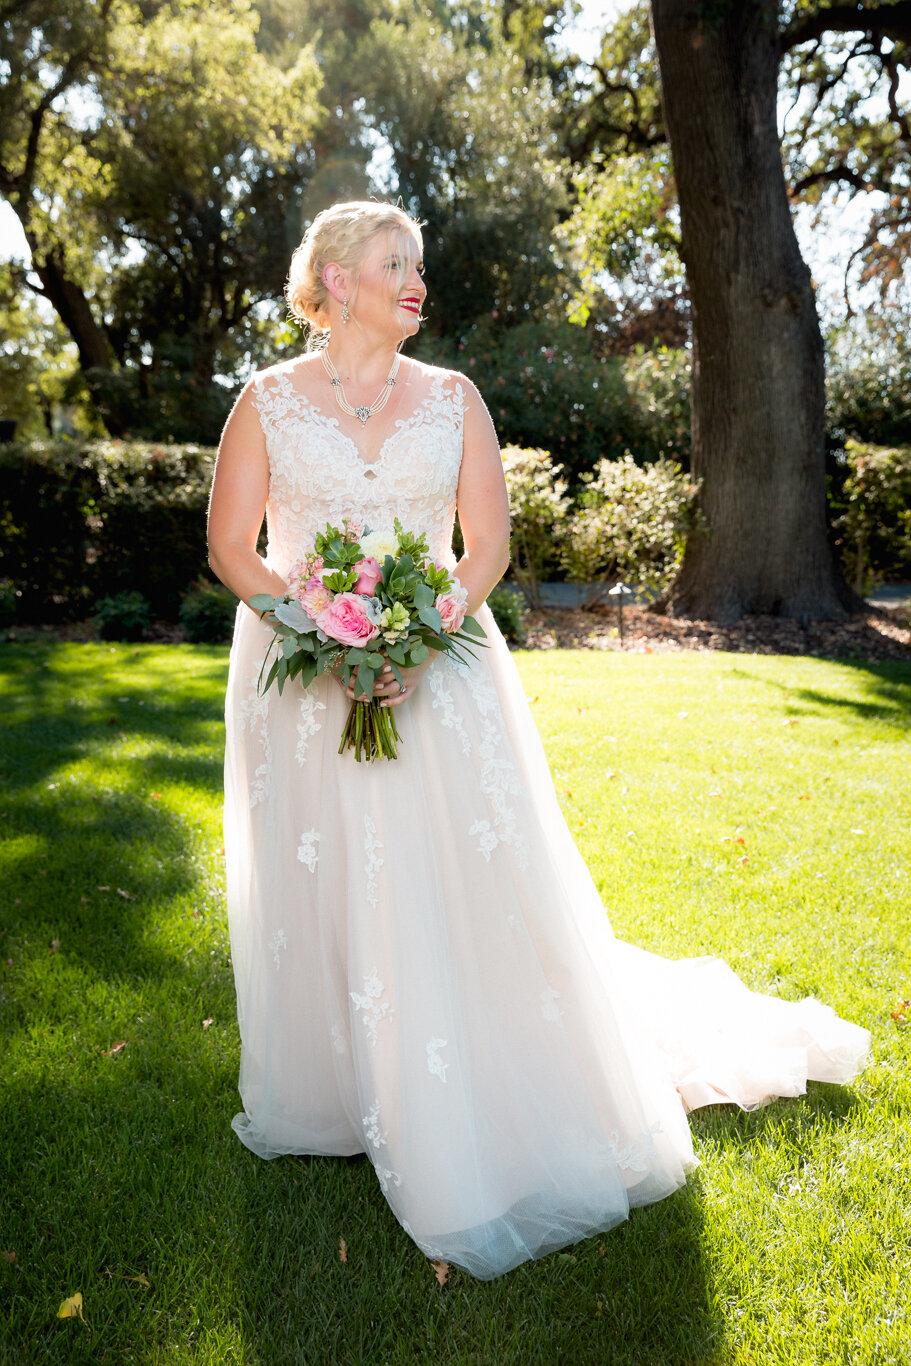 2019.08.24_Emily-Ashir-Wedding-at-the-Maples-5680.jpg